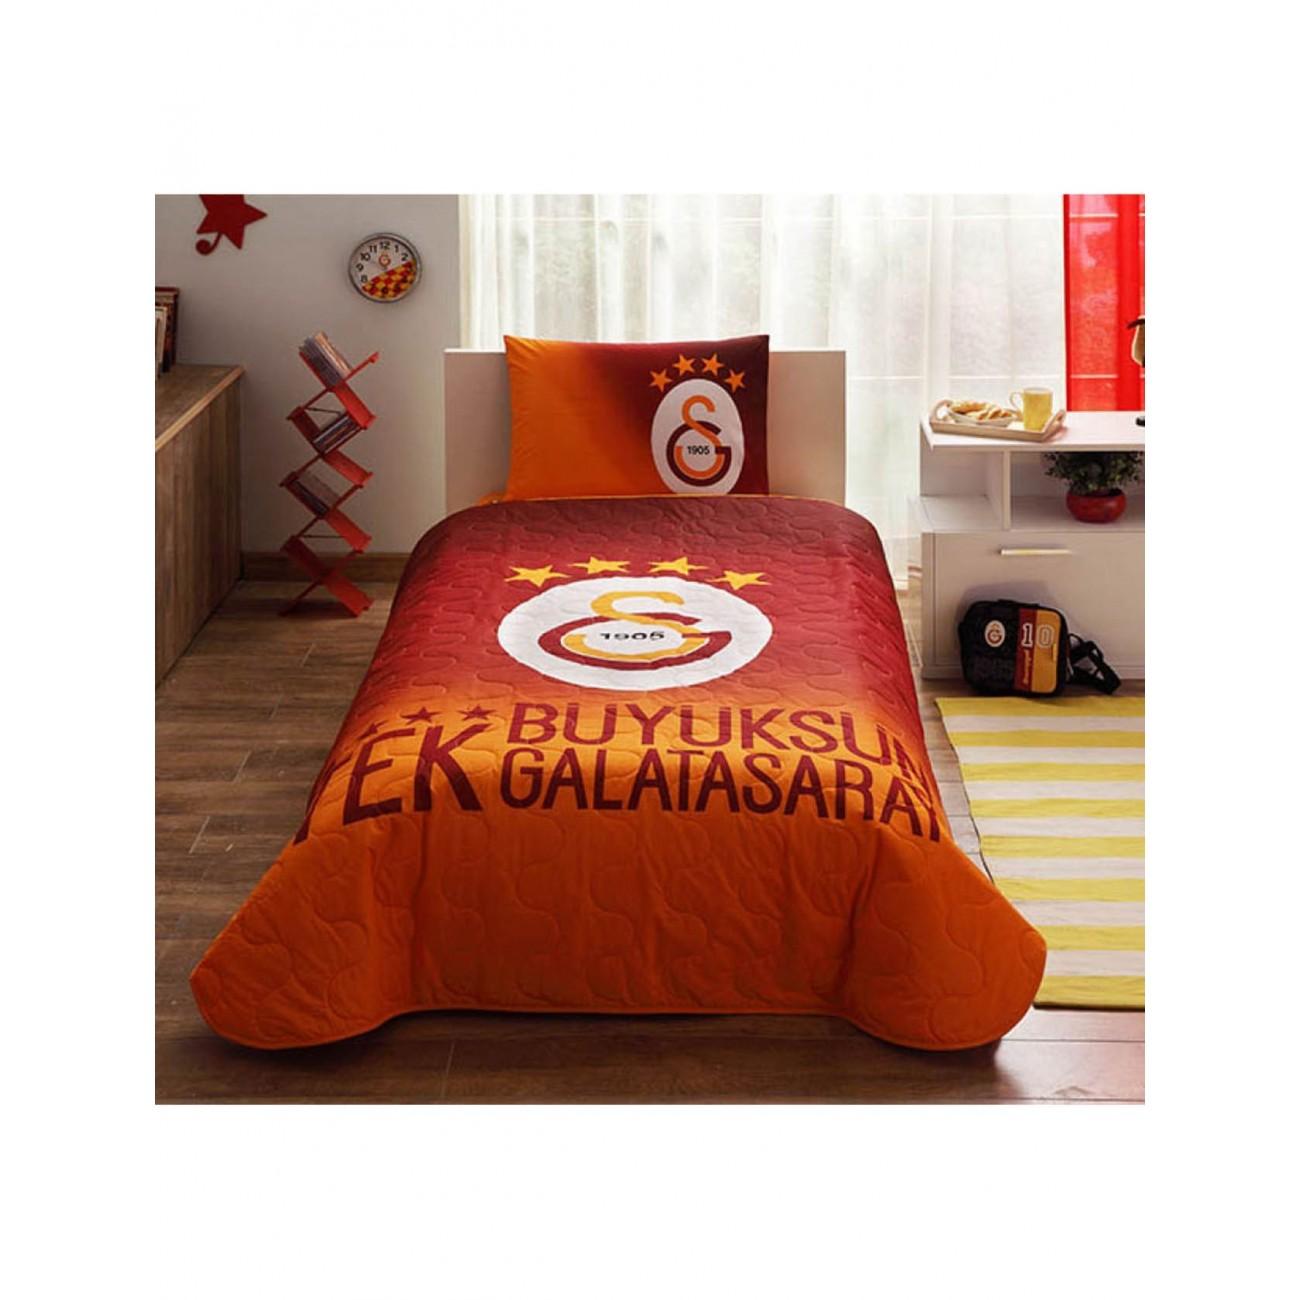 tac galatasaray 4 star decke set 160 x 220. Black Bedroom Furniture Sets. Home Design Ideas